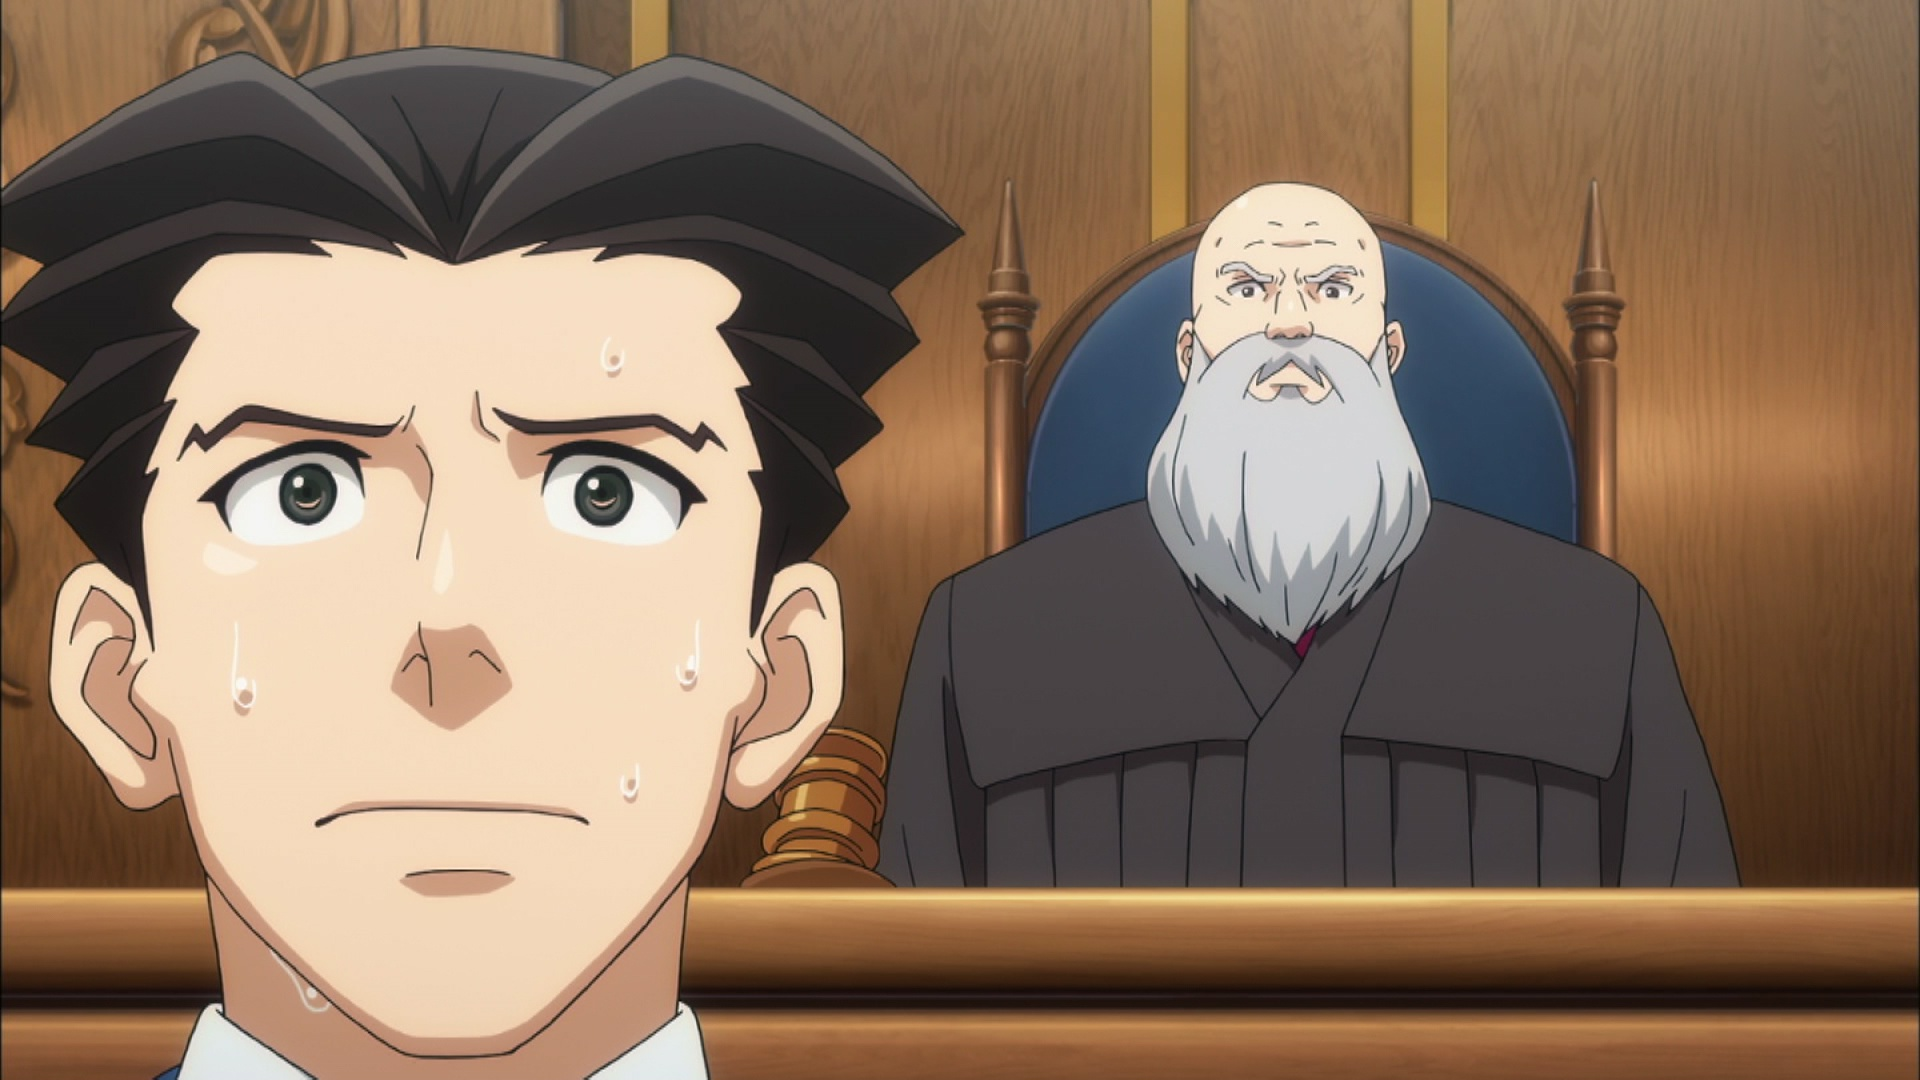 Watch Ace Attorney Season 2 Episode 25 Sub Dub Anime Uncut